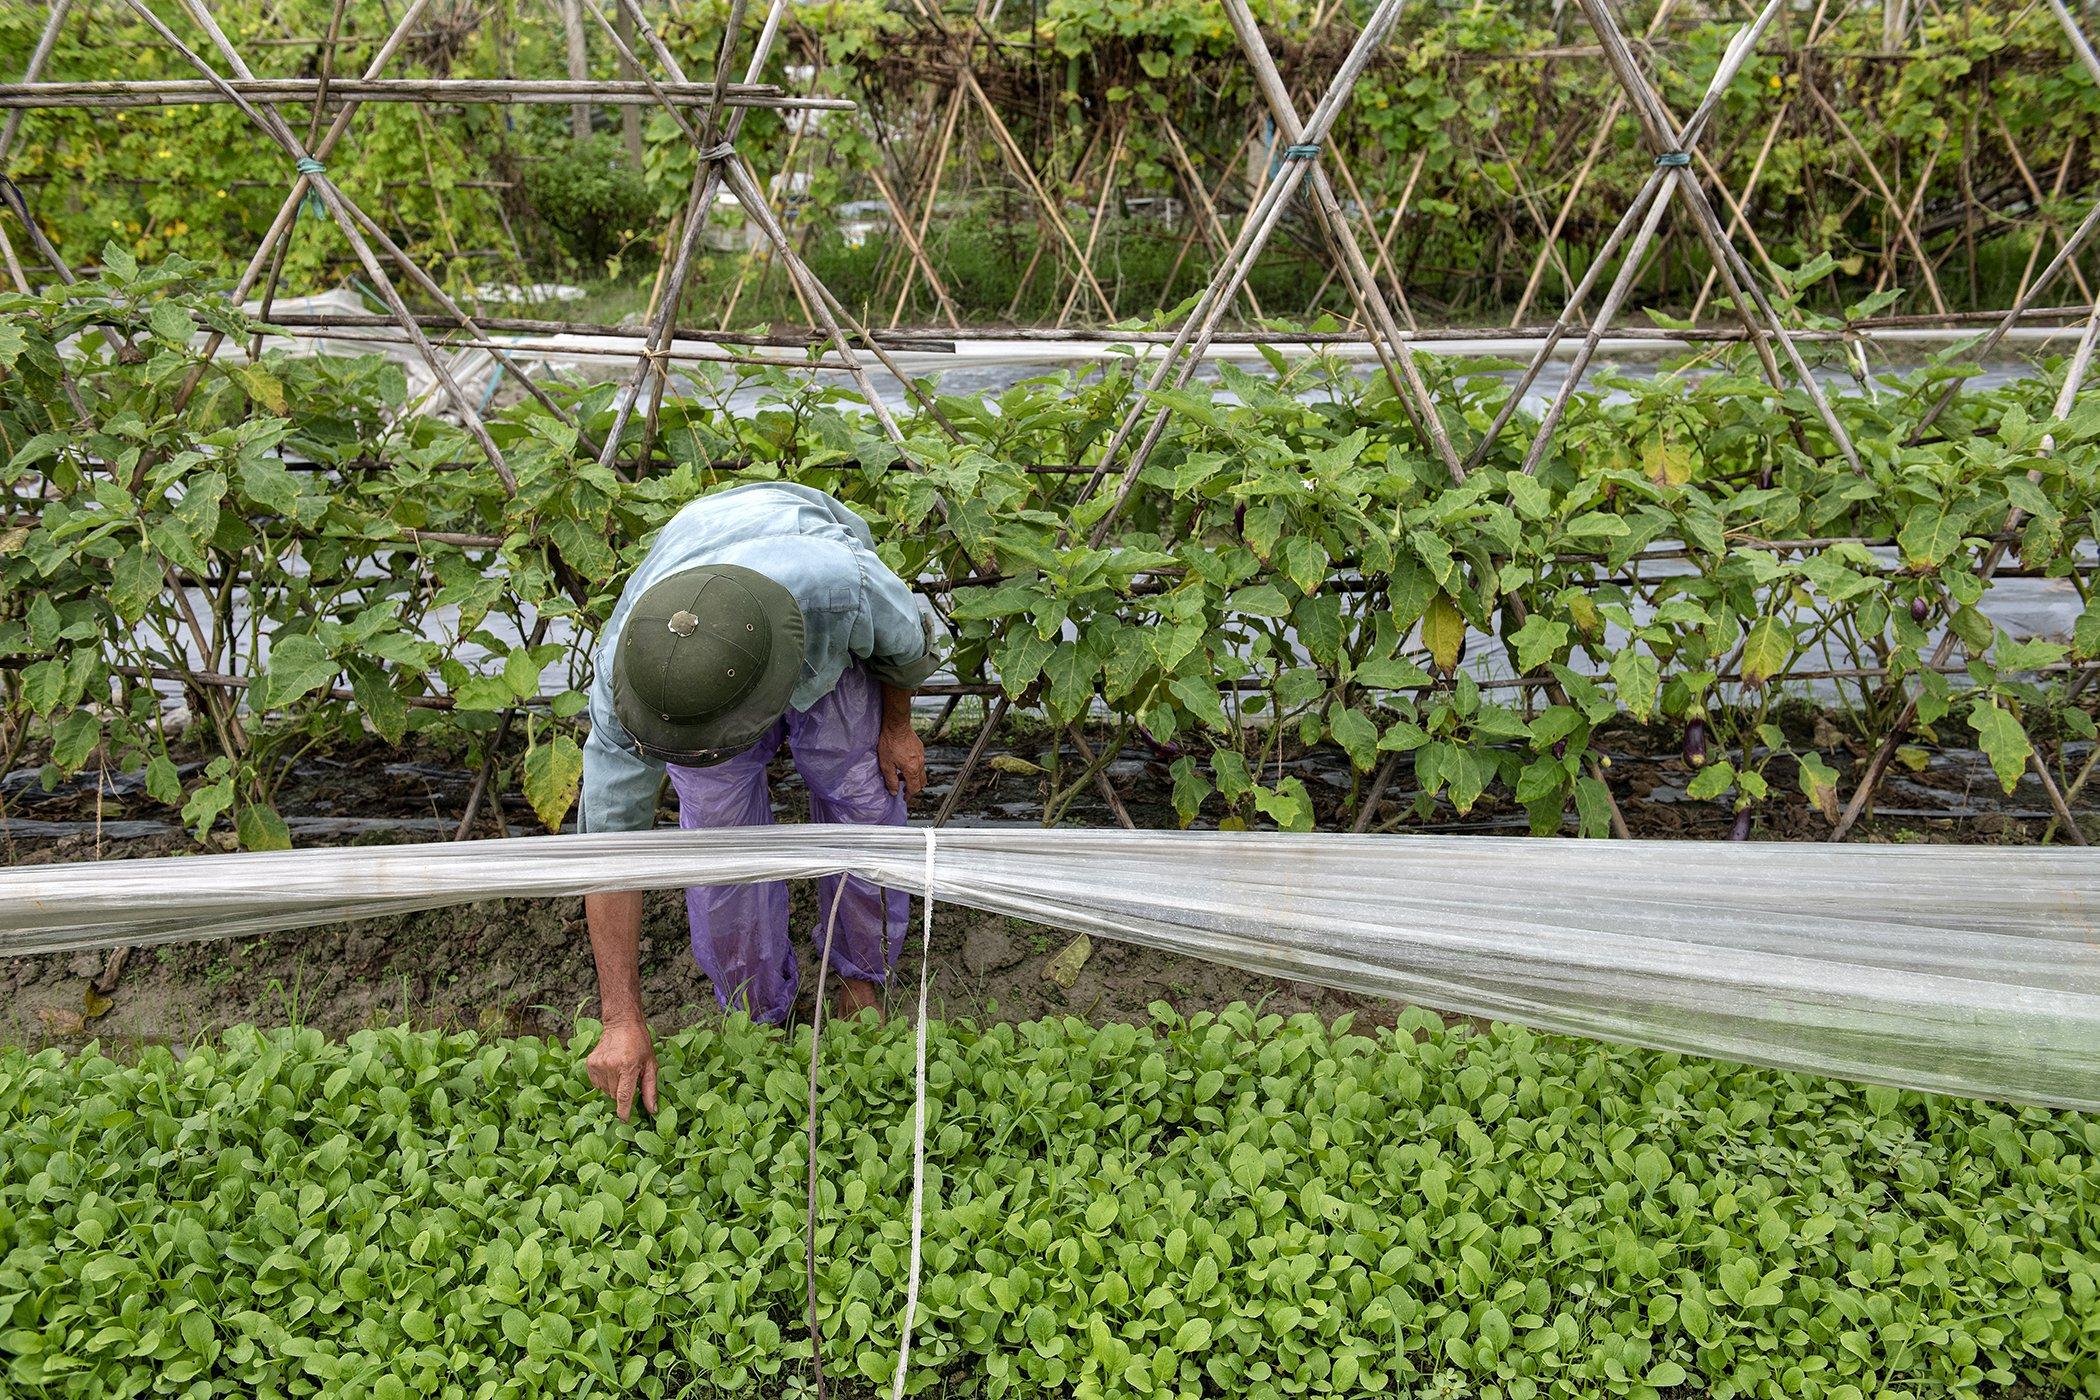 hunger-farmer-soultion-cgiar.jpg__2100x1400_q85_crop_subject_location-1050,700_subsampling-2_upscale.jpg